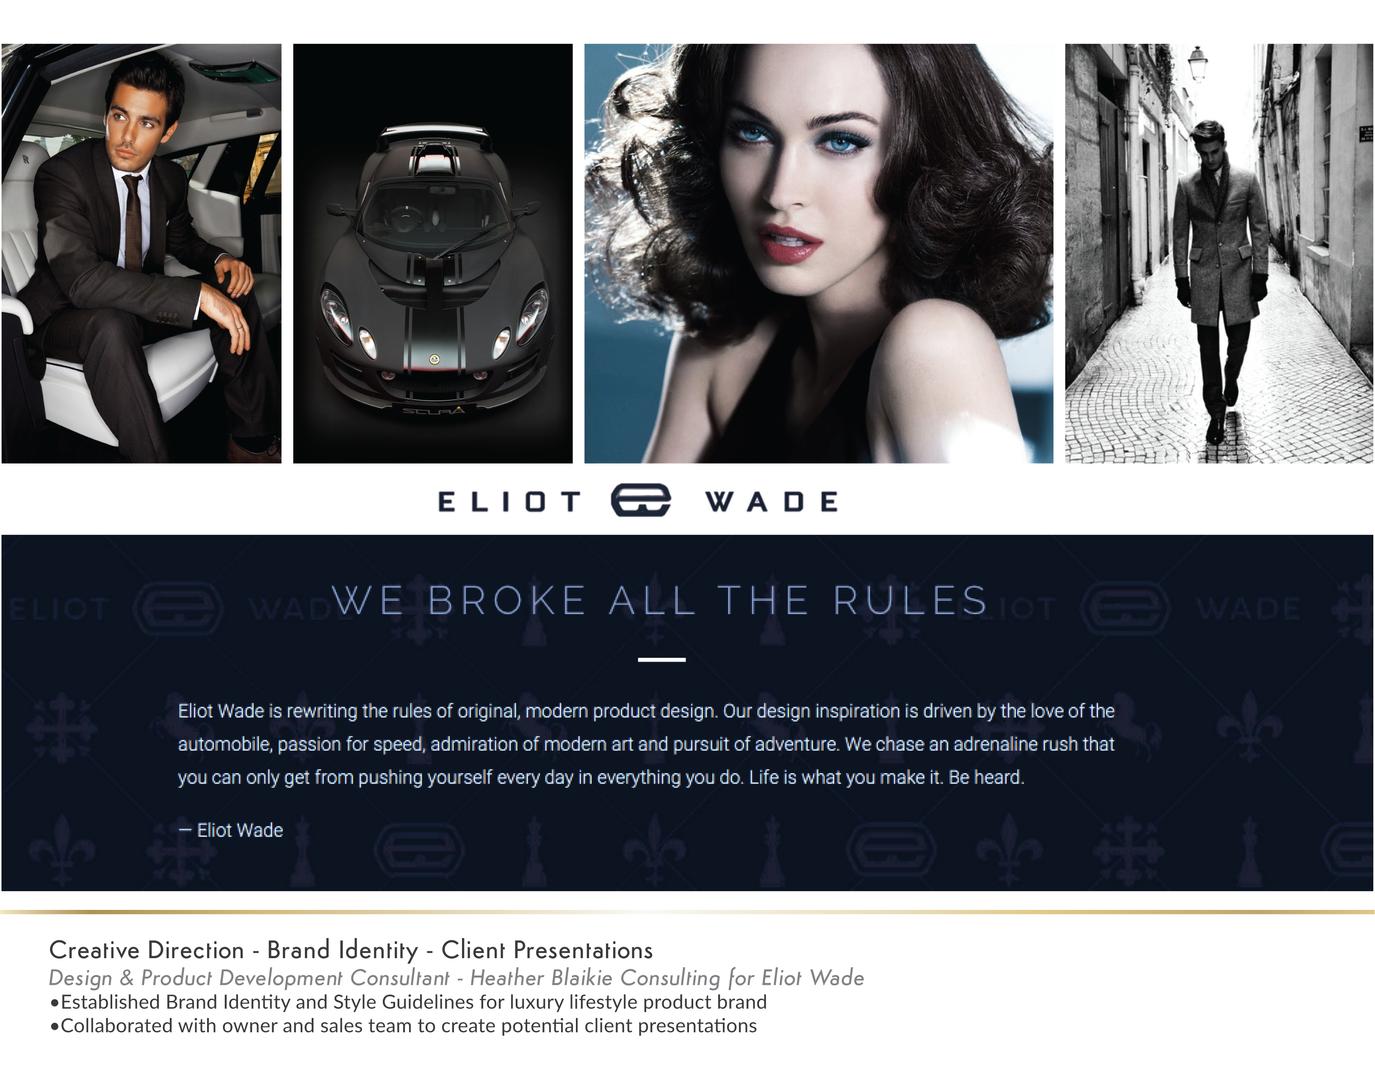 Eliot Wade Client Presentation